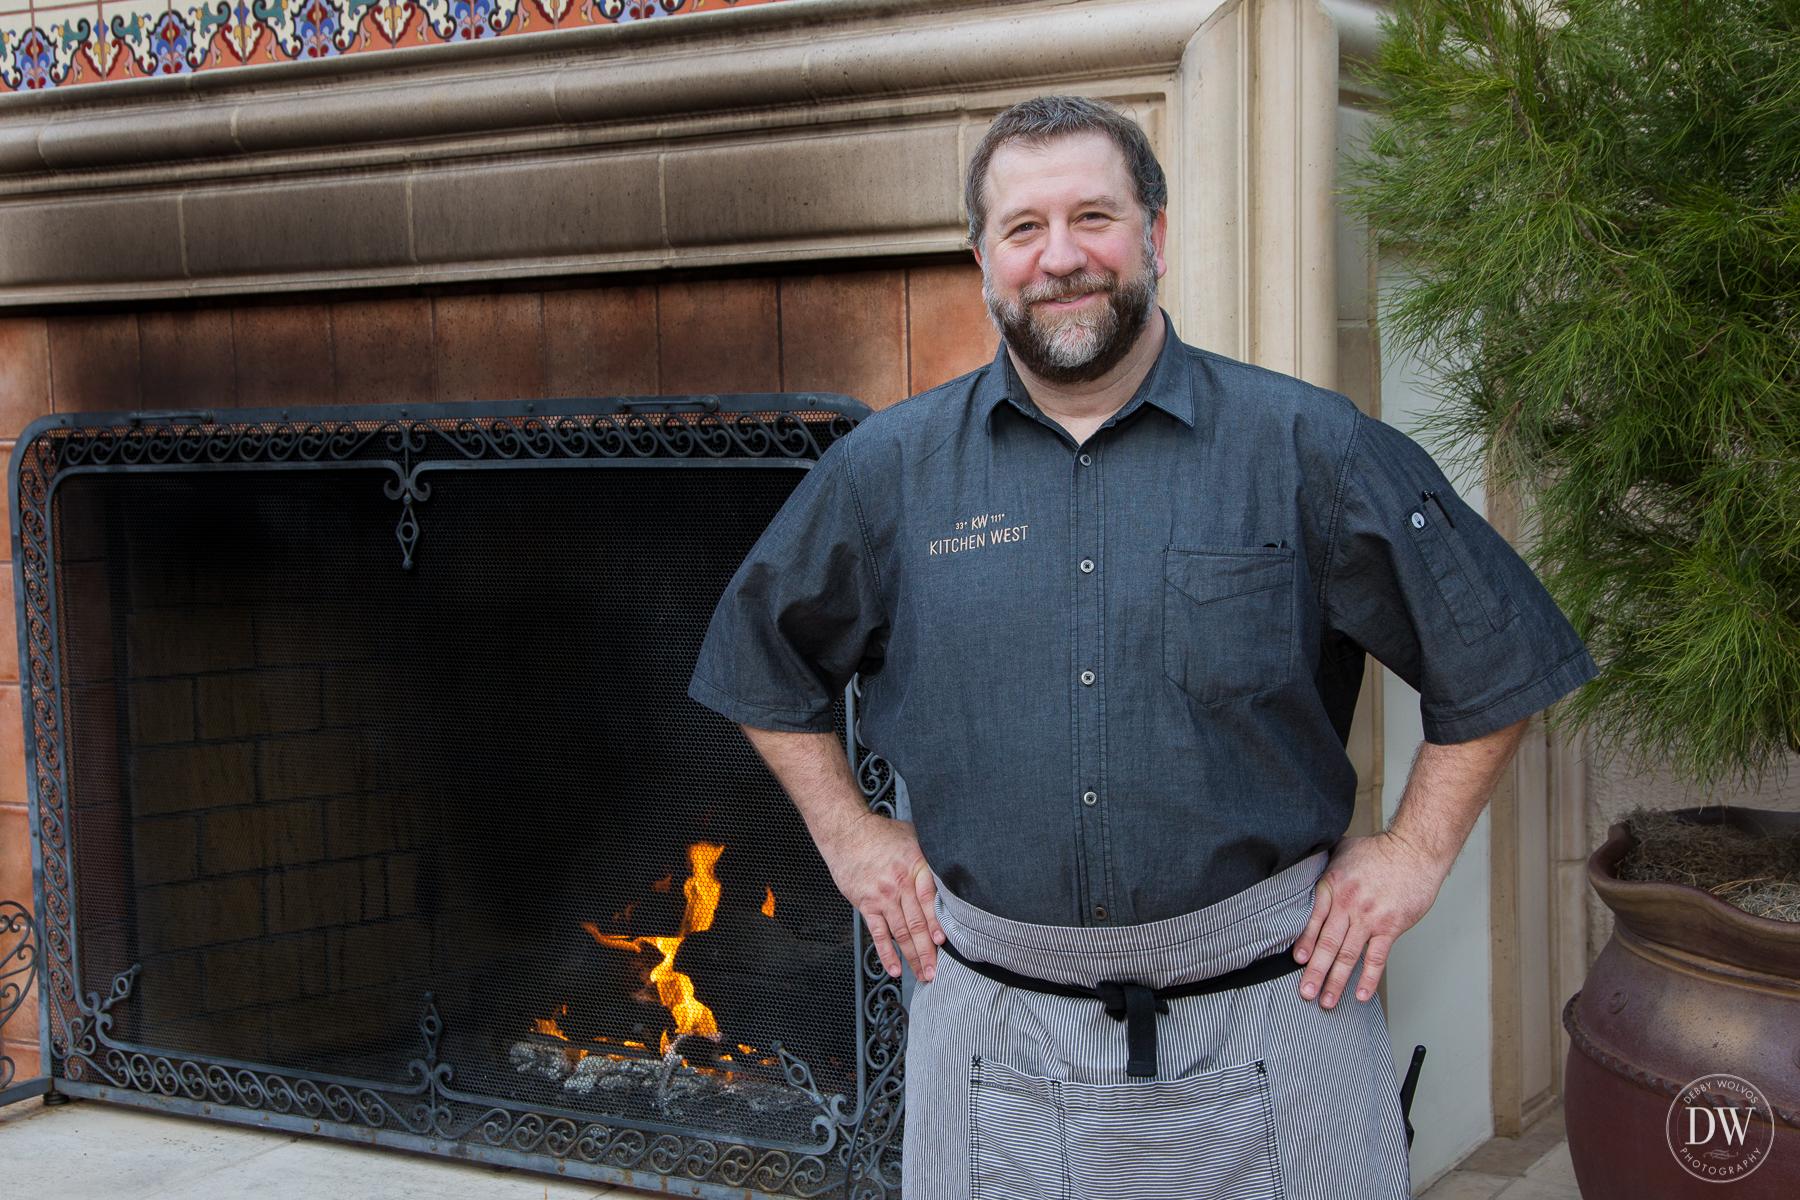 Executive Chef Rick Dupere Kitchen West